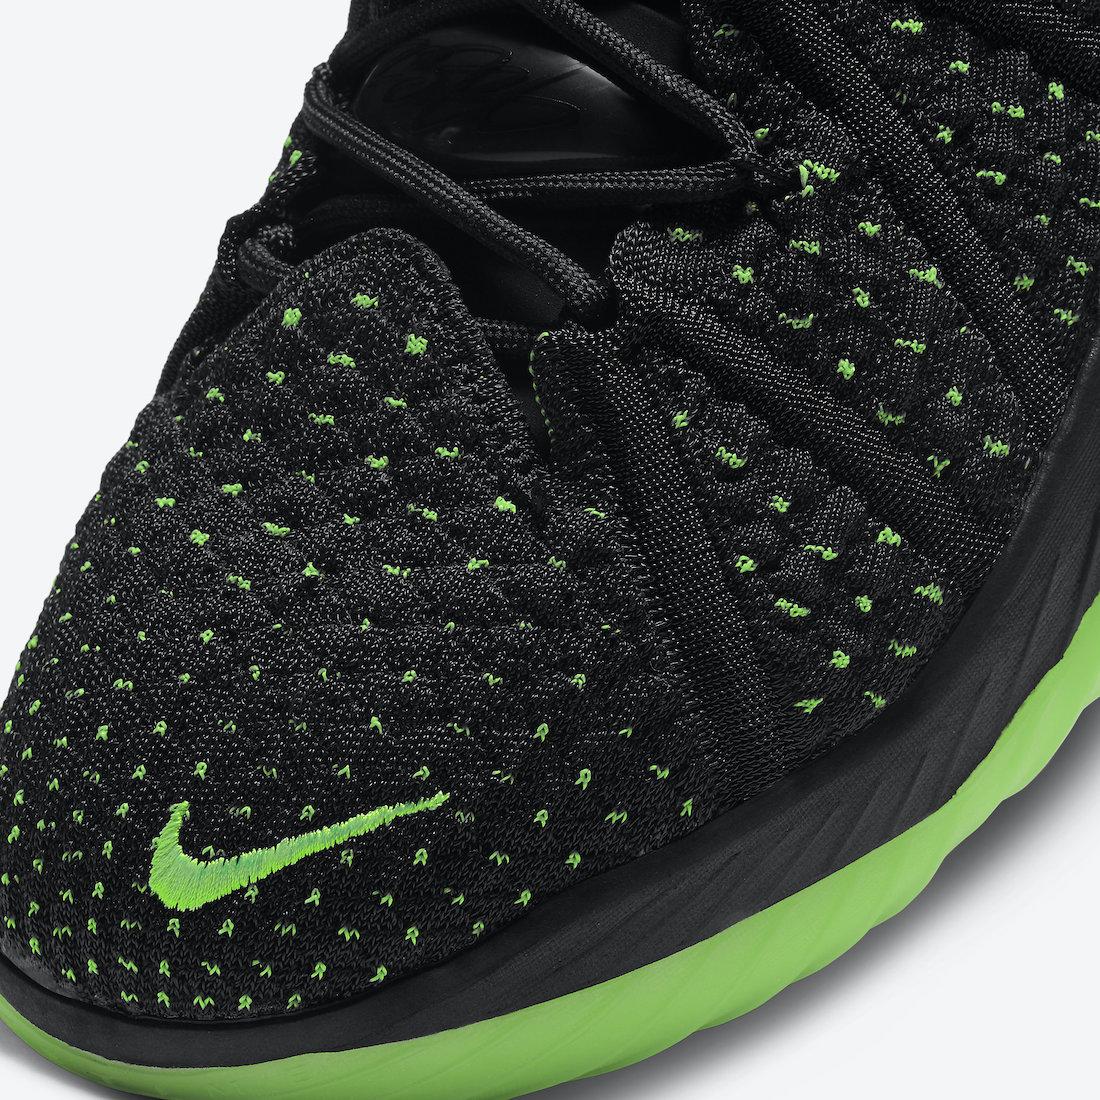 Nike-LeBron-18-Dunkman-CQ9284-005-Release-Date-6